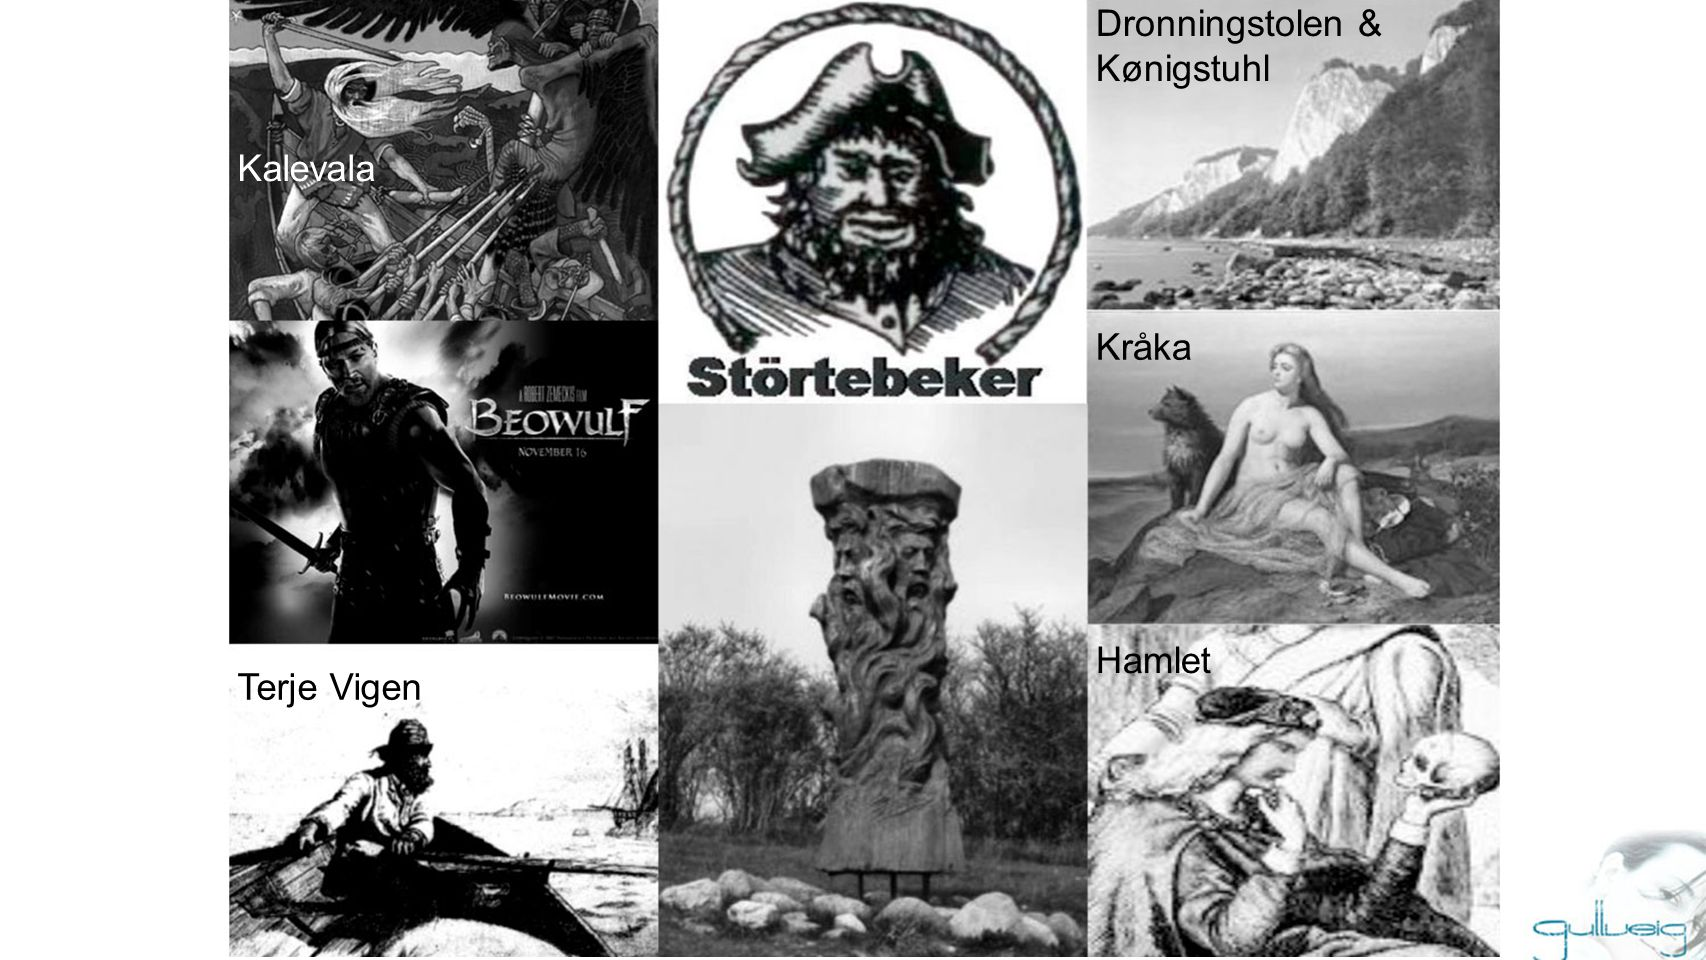 Hamlet Kråka Dronningstolen & Kønigstuhl Terje Vigen Kalevala